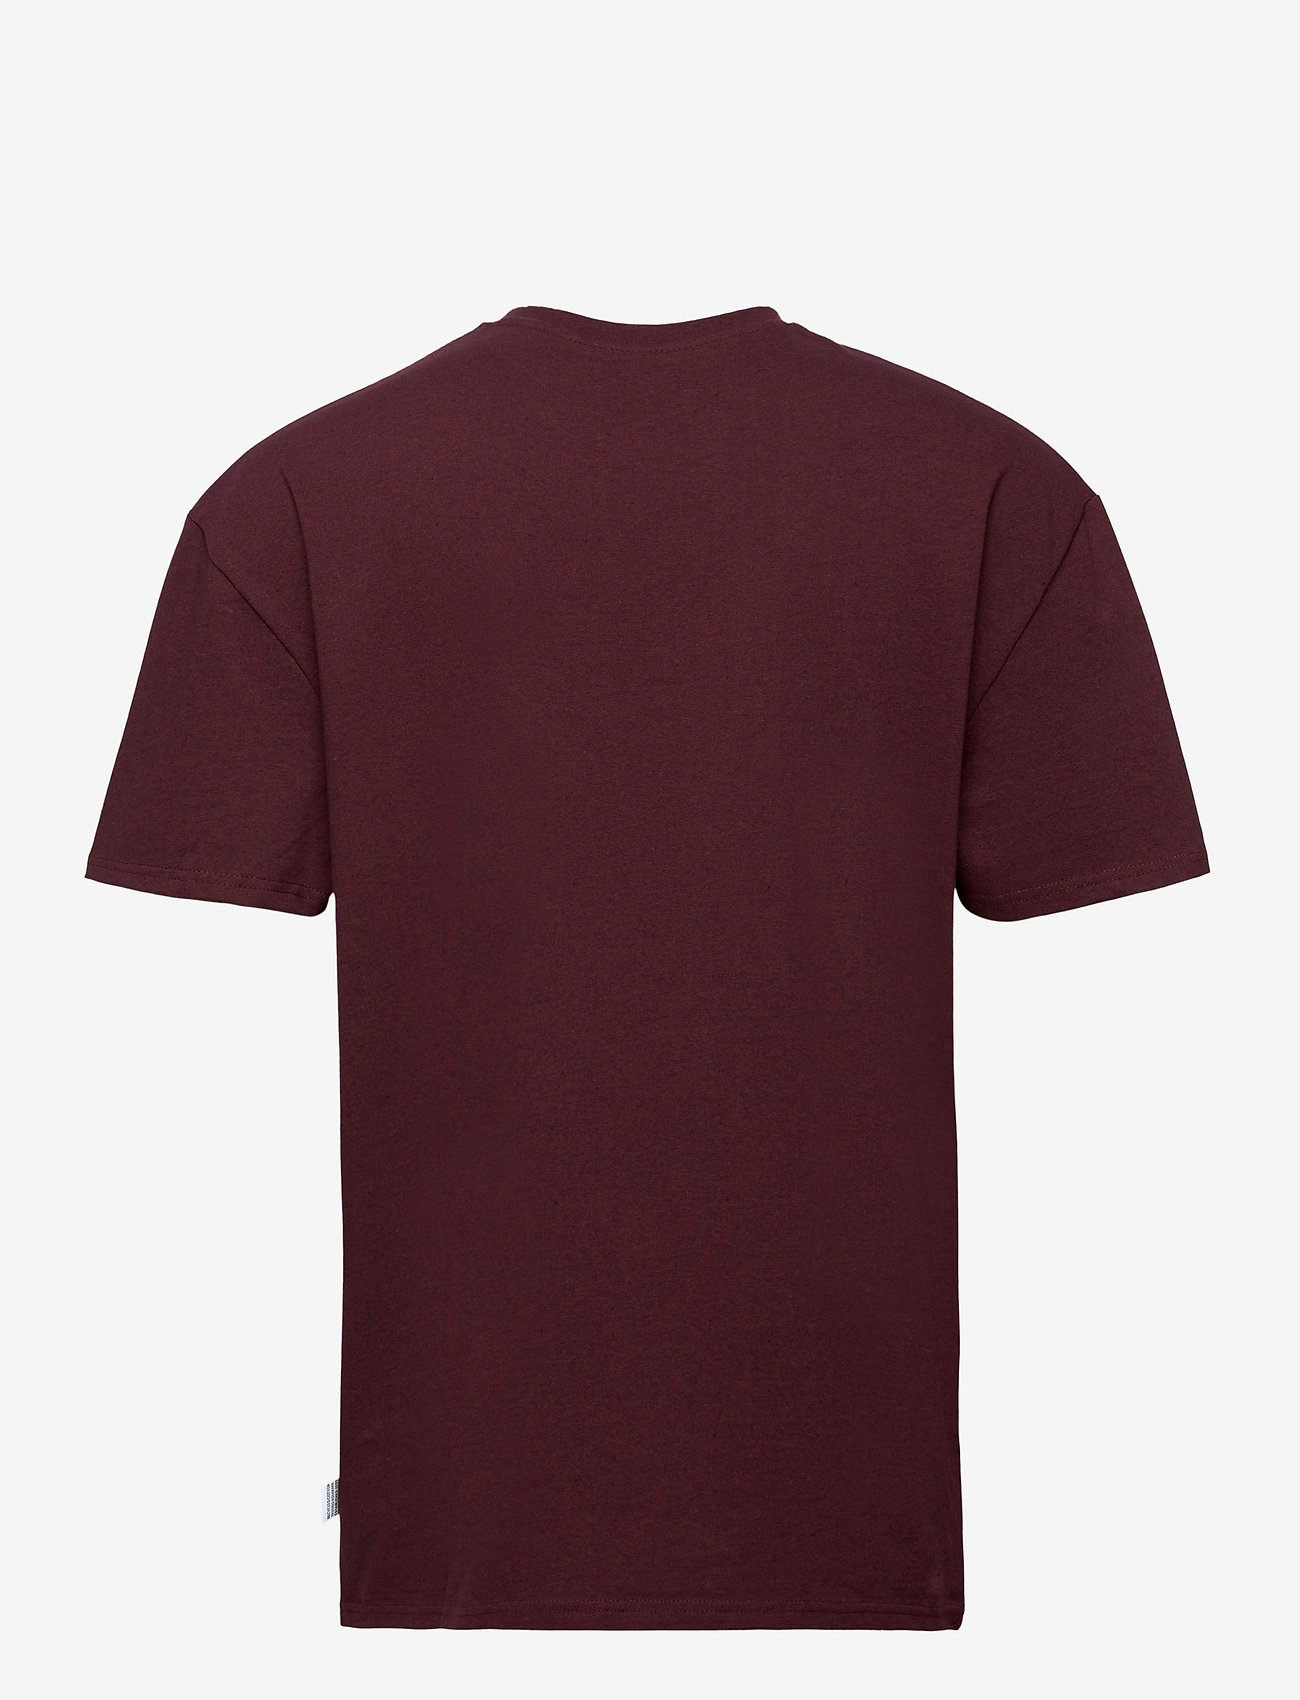 Kronstadt - Martin Recycled cotton boxfit t-shirt - basic t-shirts - sangria - 1